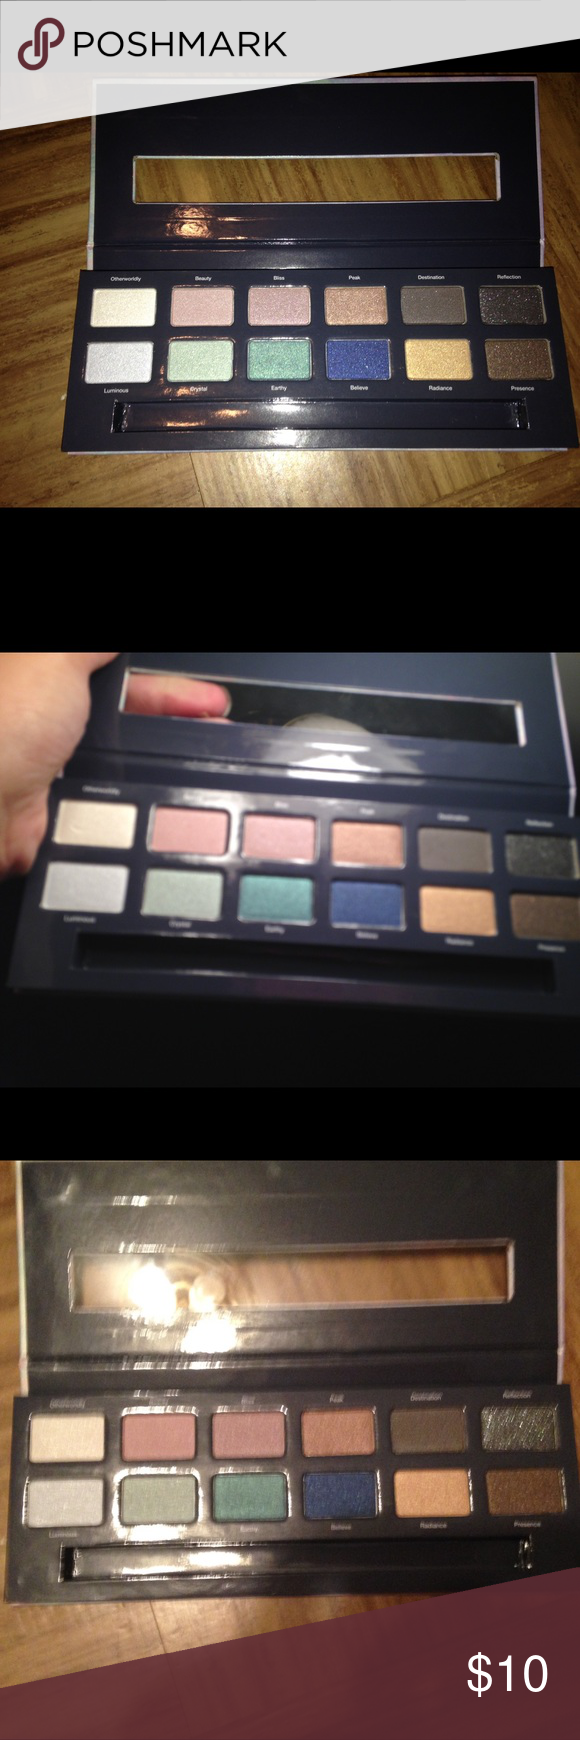 NWOT ULTA eyeshadow palette!!!! the ULTA prismatic palette